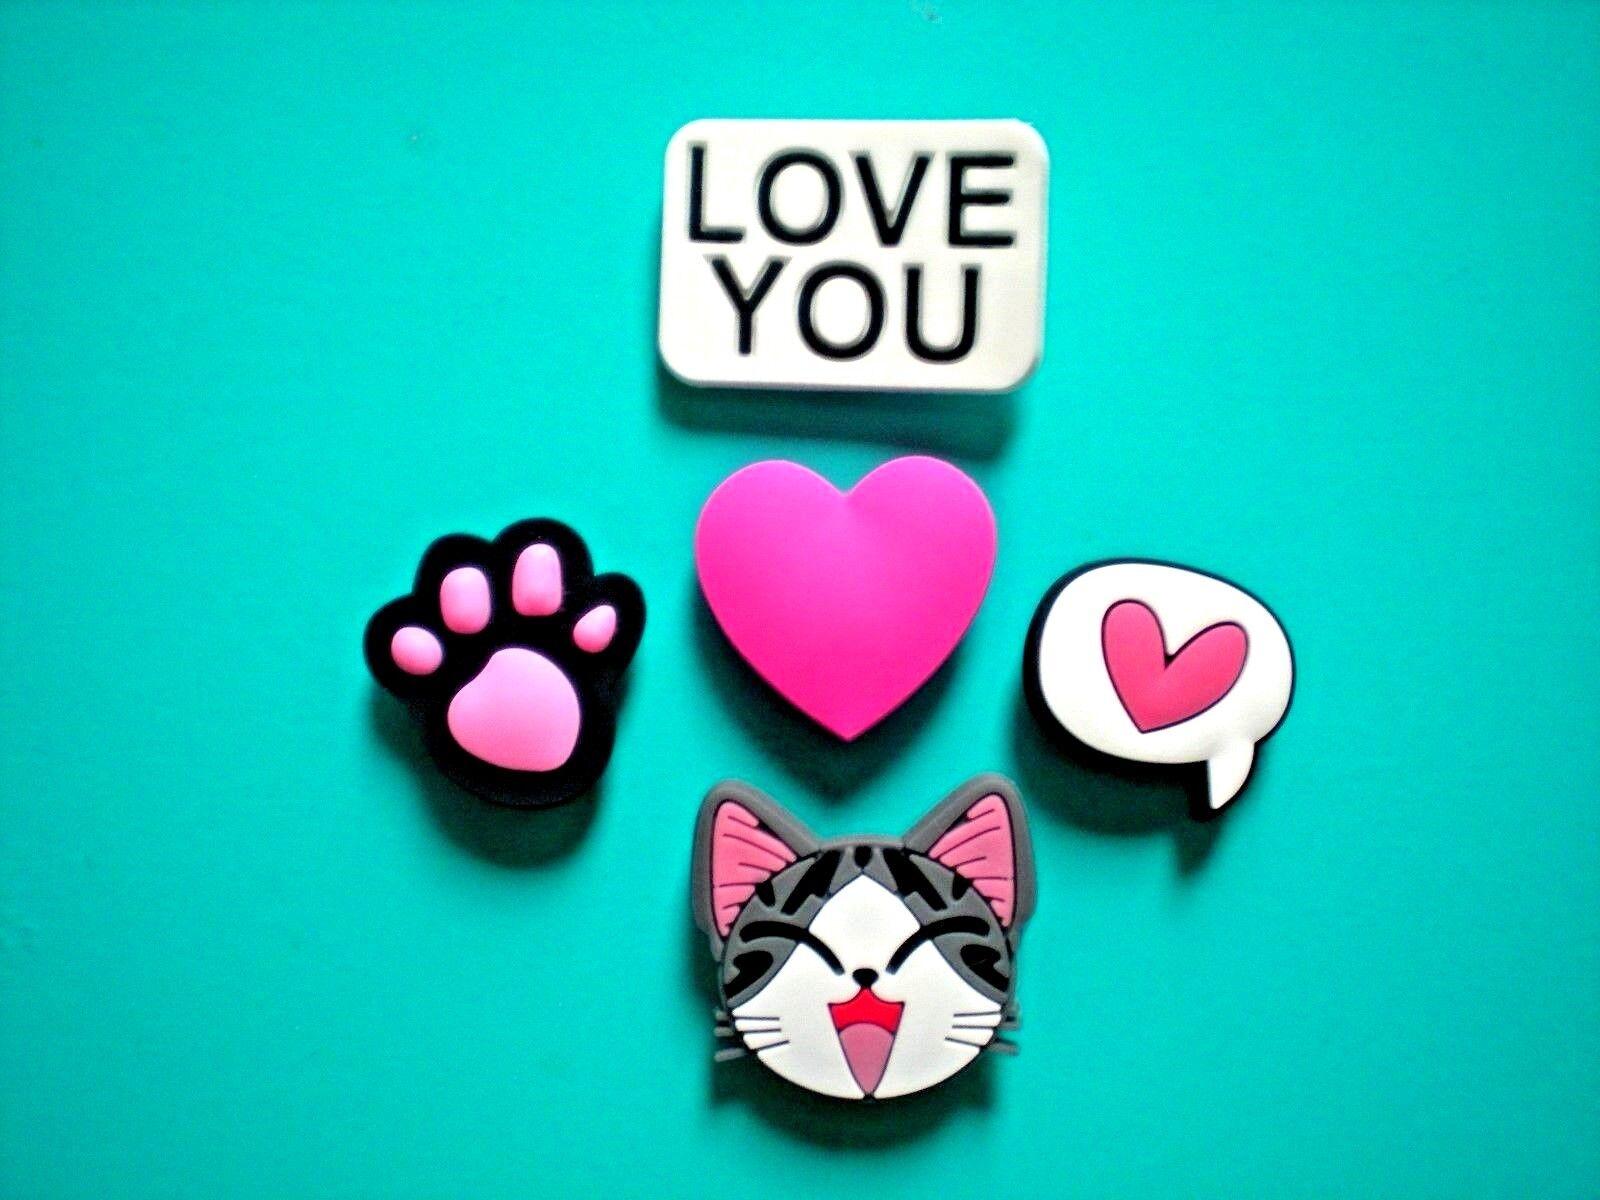 Clog Shoe Sandal Plug Button Charm For Jibbitz WristBand Kitty Cat Pink Paw